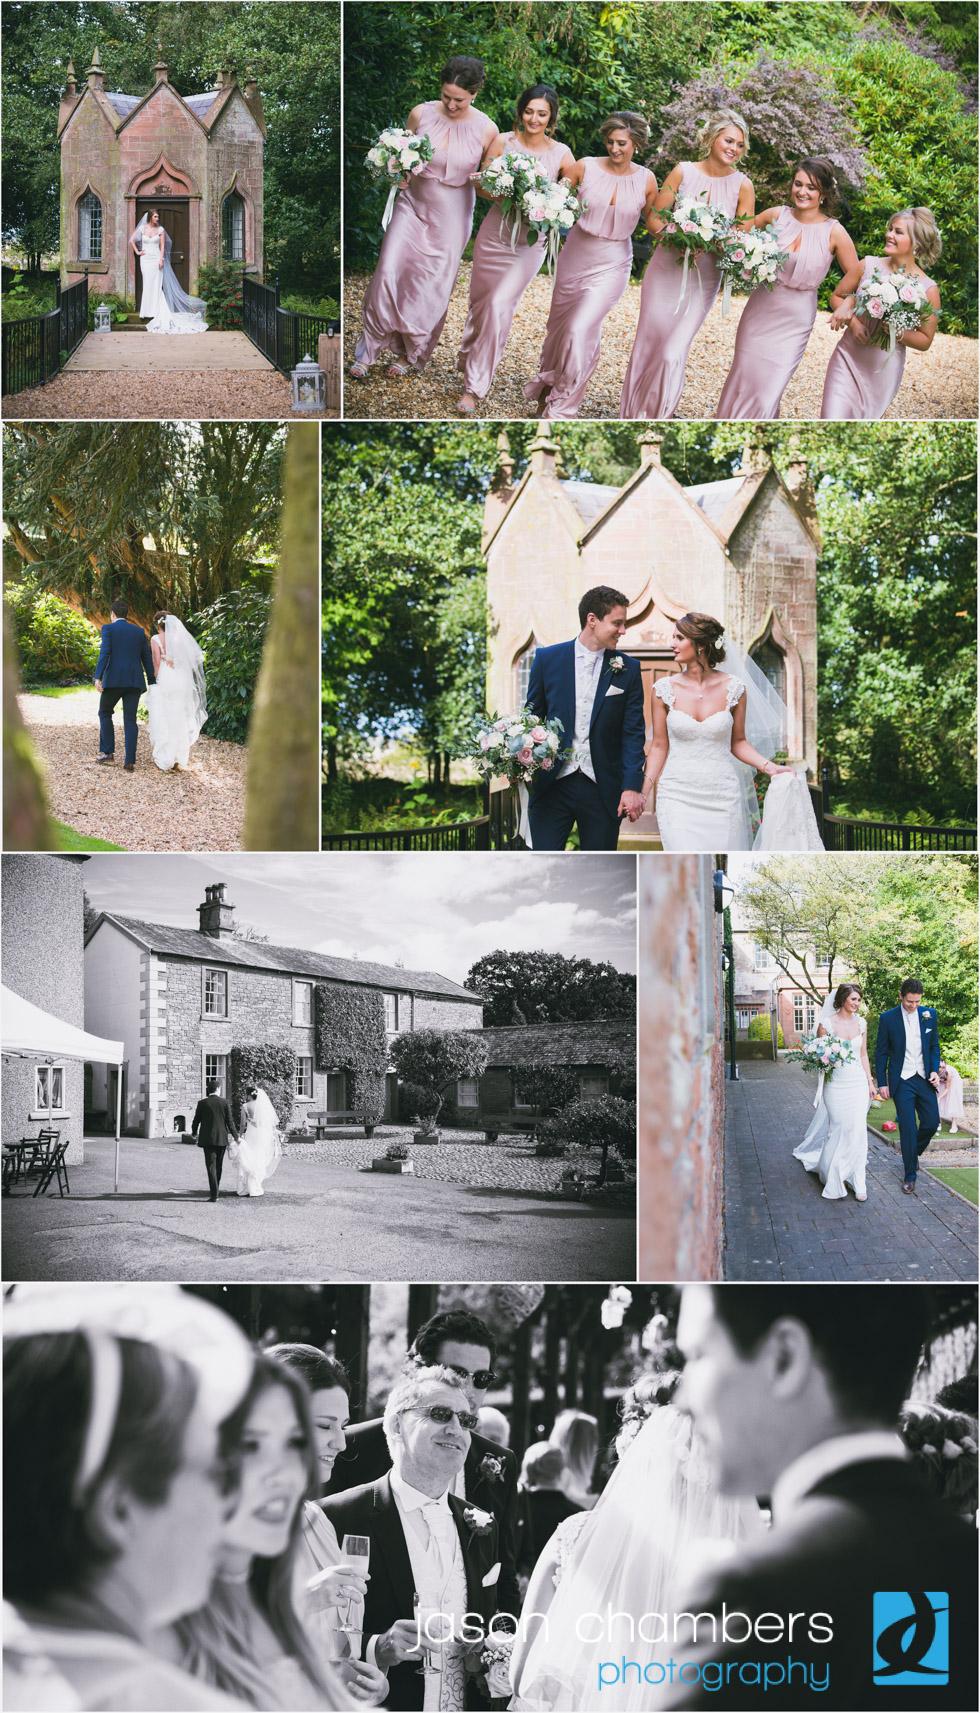 Blaithwaite-Estate-Wedding-Photographs0009